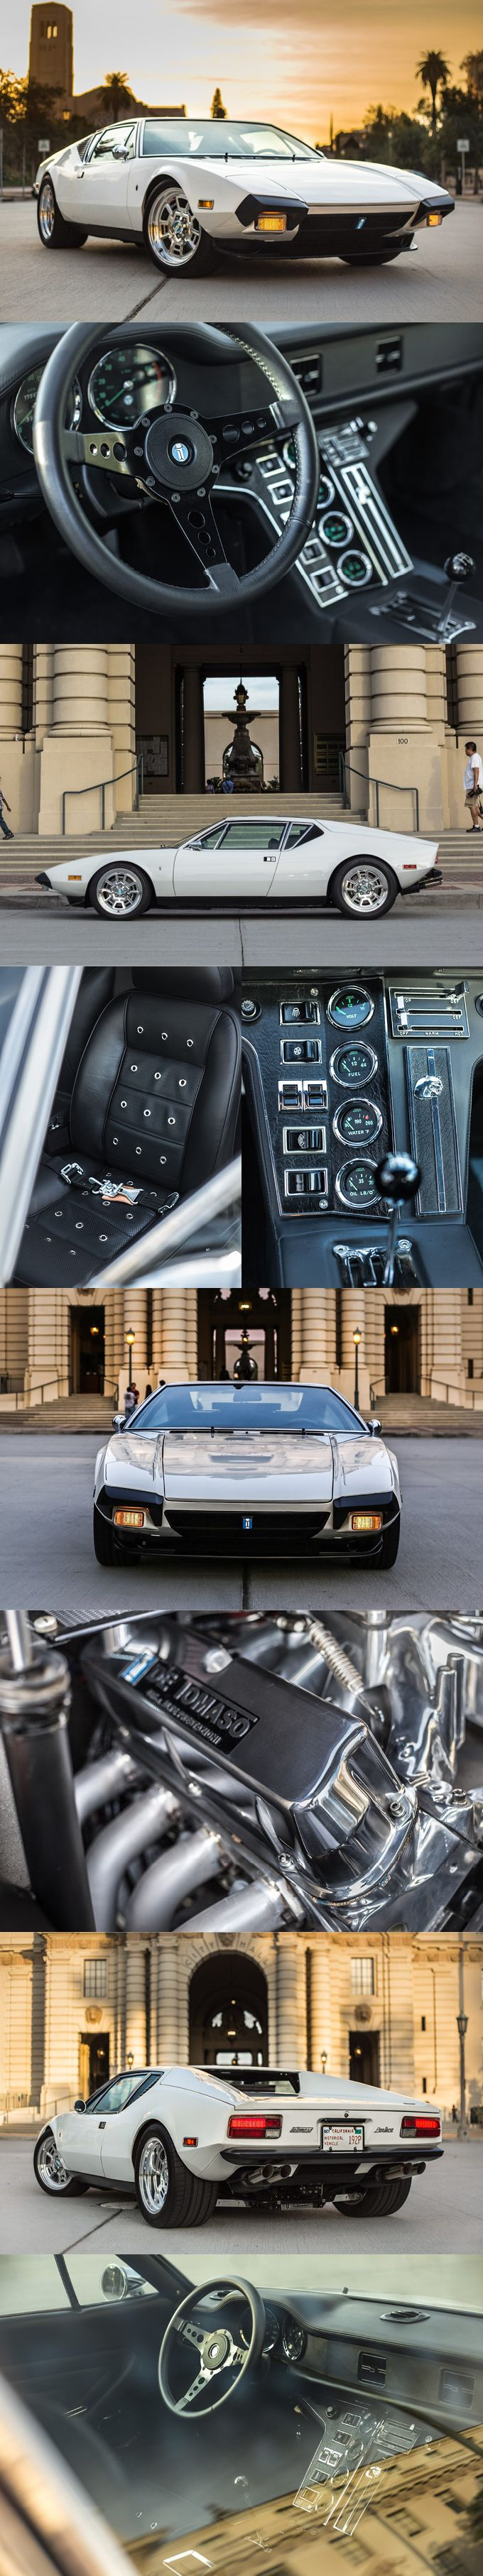 419 best voiture images on Pinterest